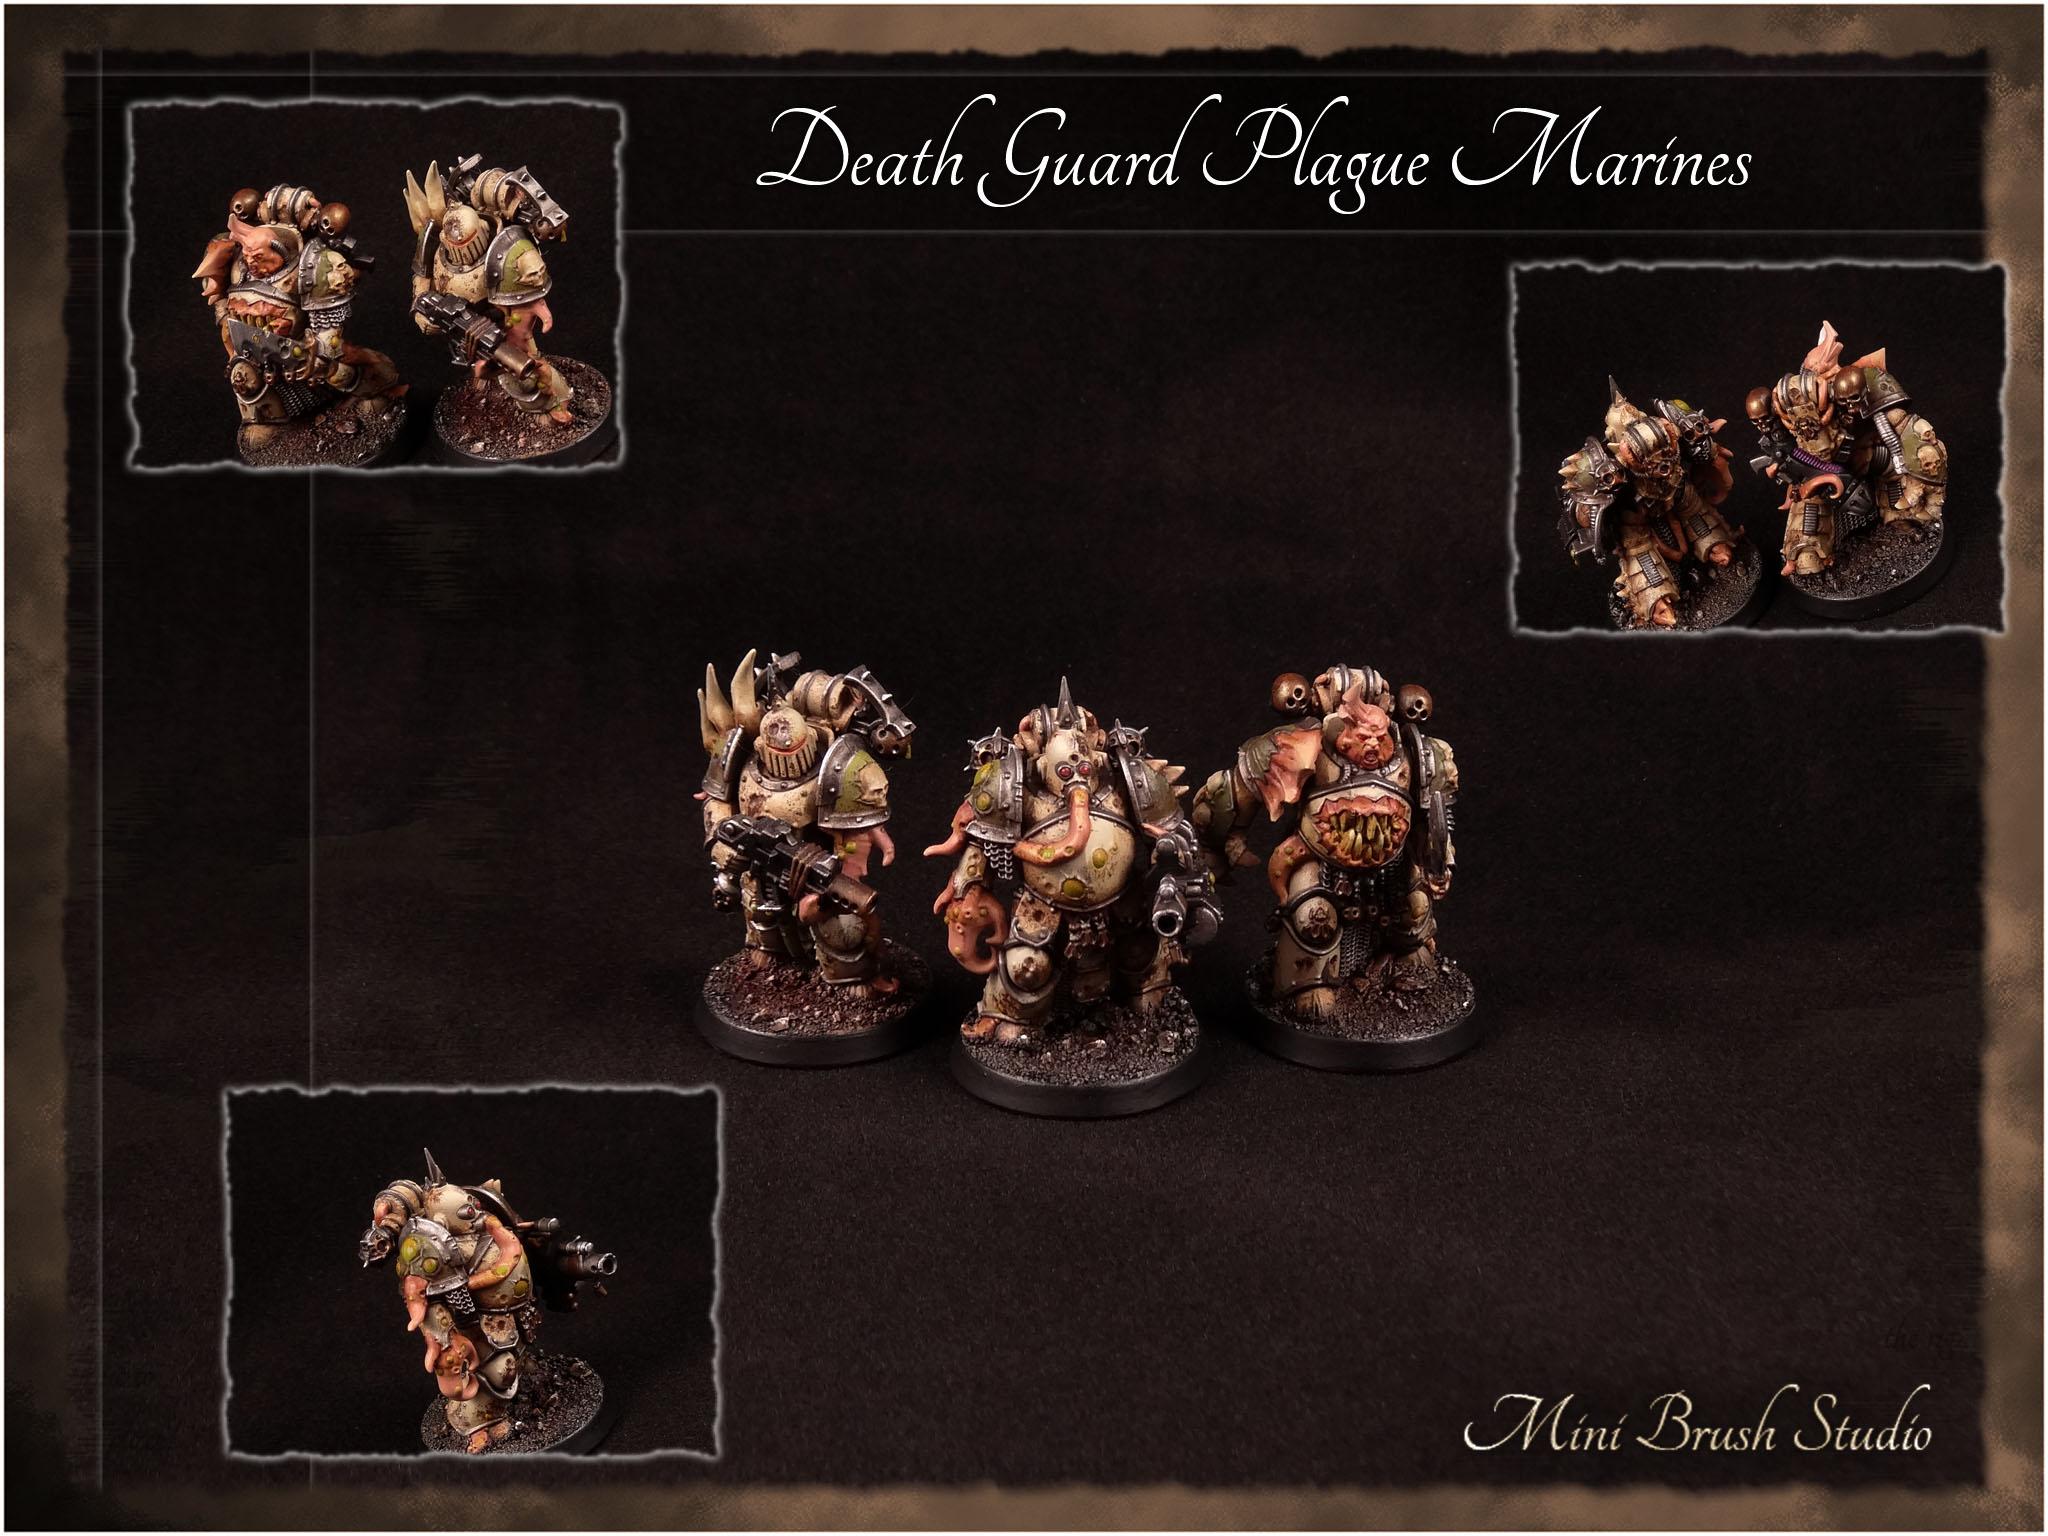 Death Guard Plague Marines 1 v7.00.jpg